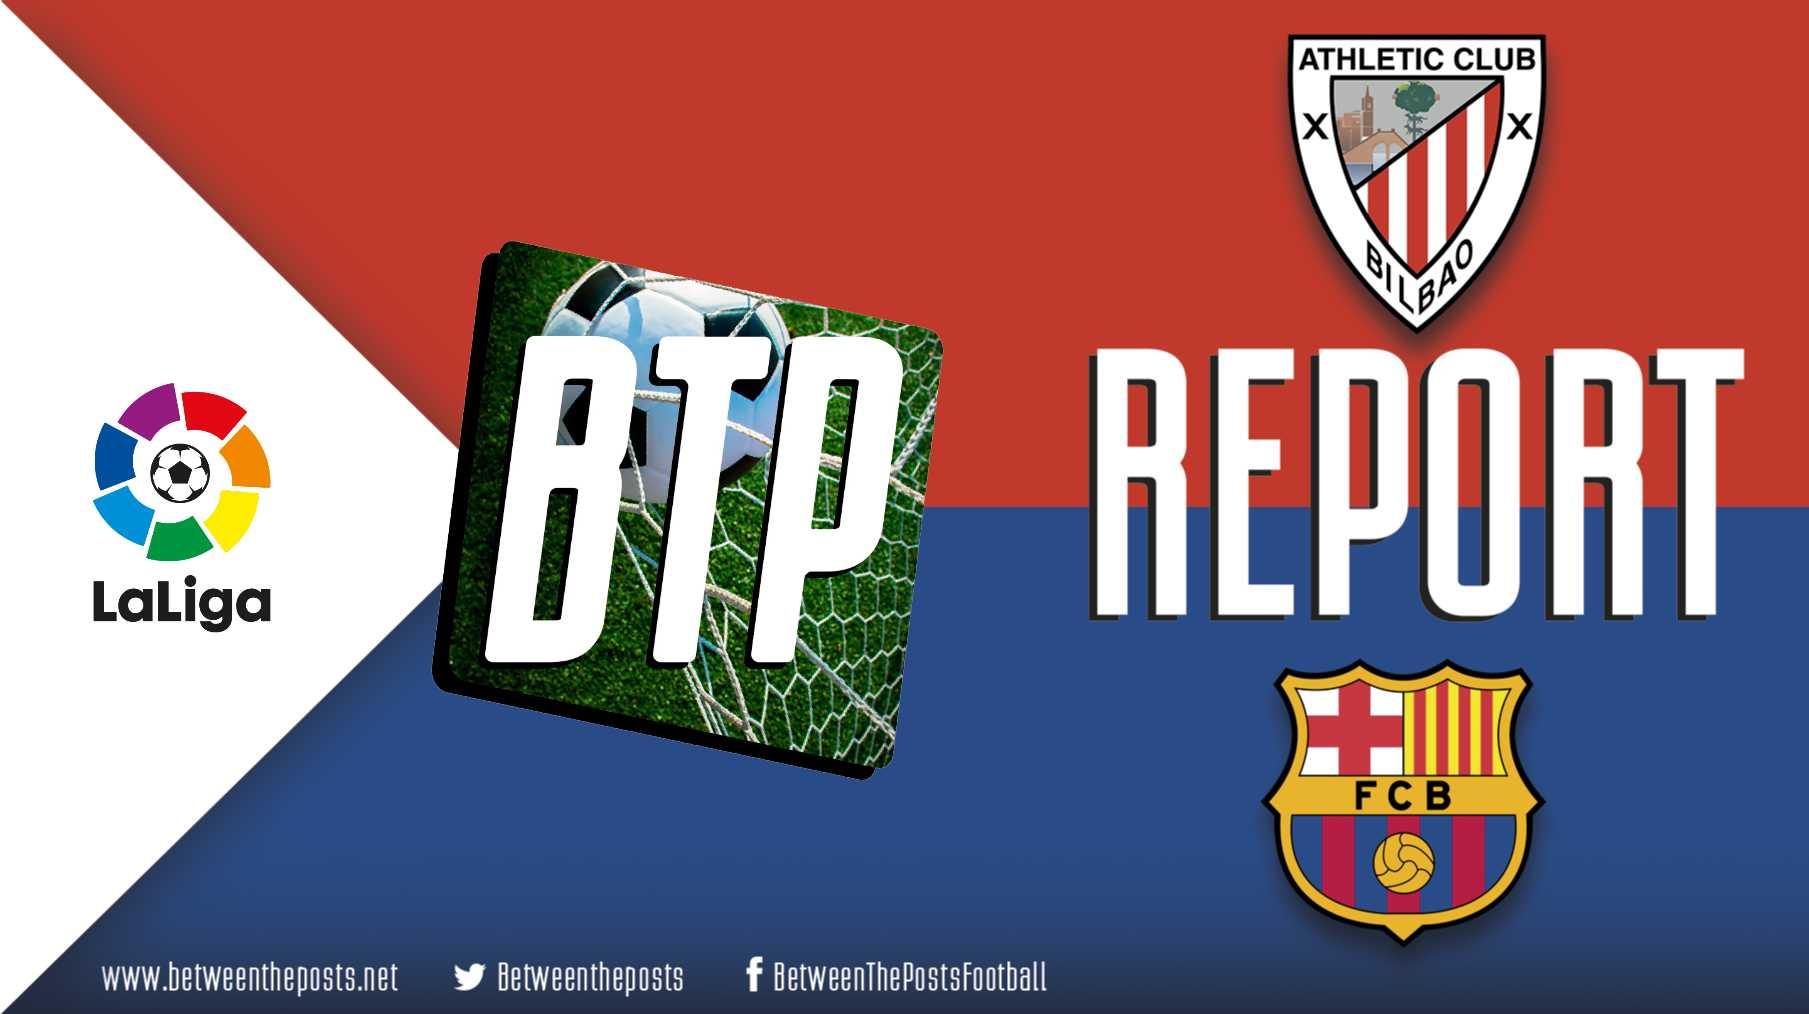 Tactical analysis Athletic Club Barcelona 1-1 LaLiga